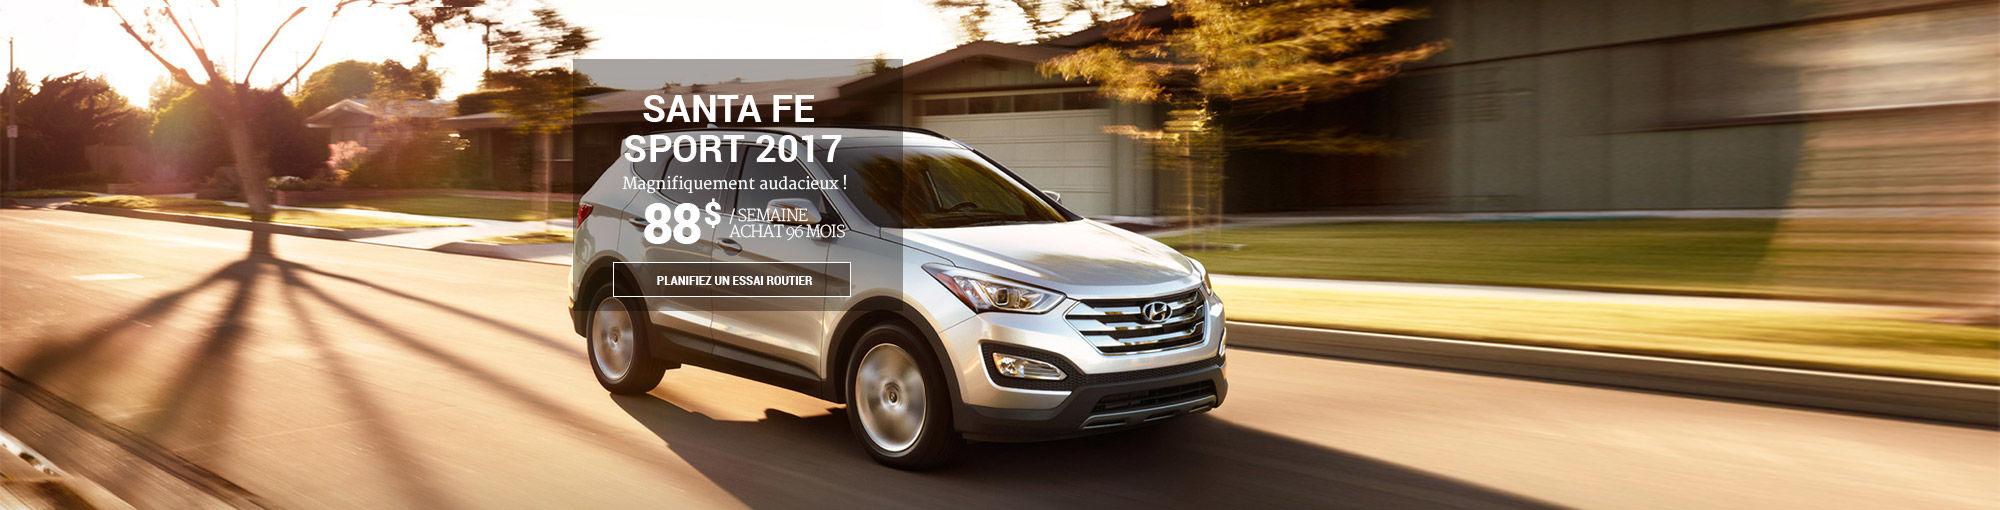 Hyundai Santa Fe Sport 2016 - header - août 2016 - HTR